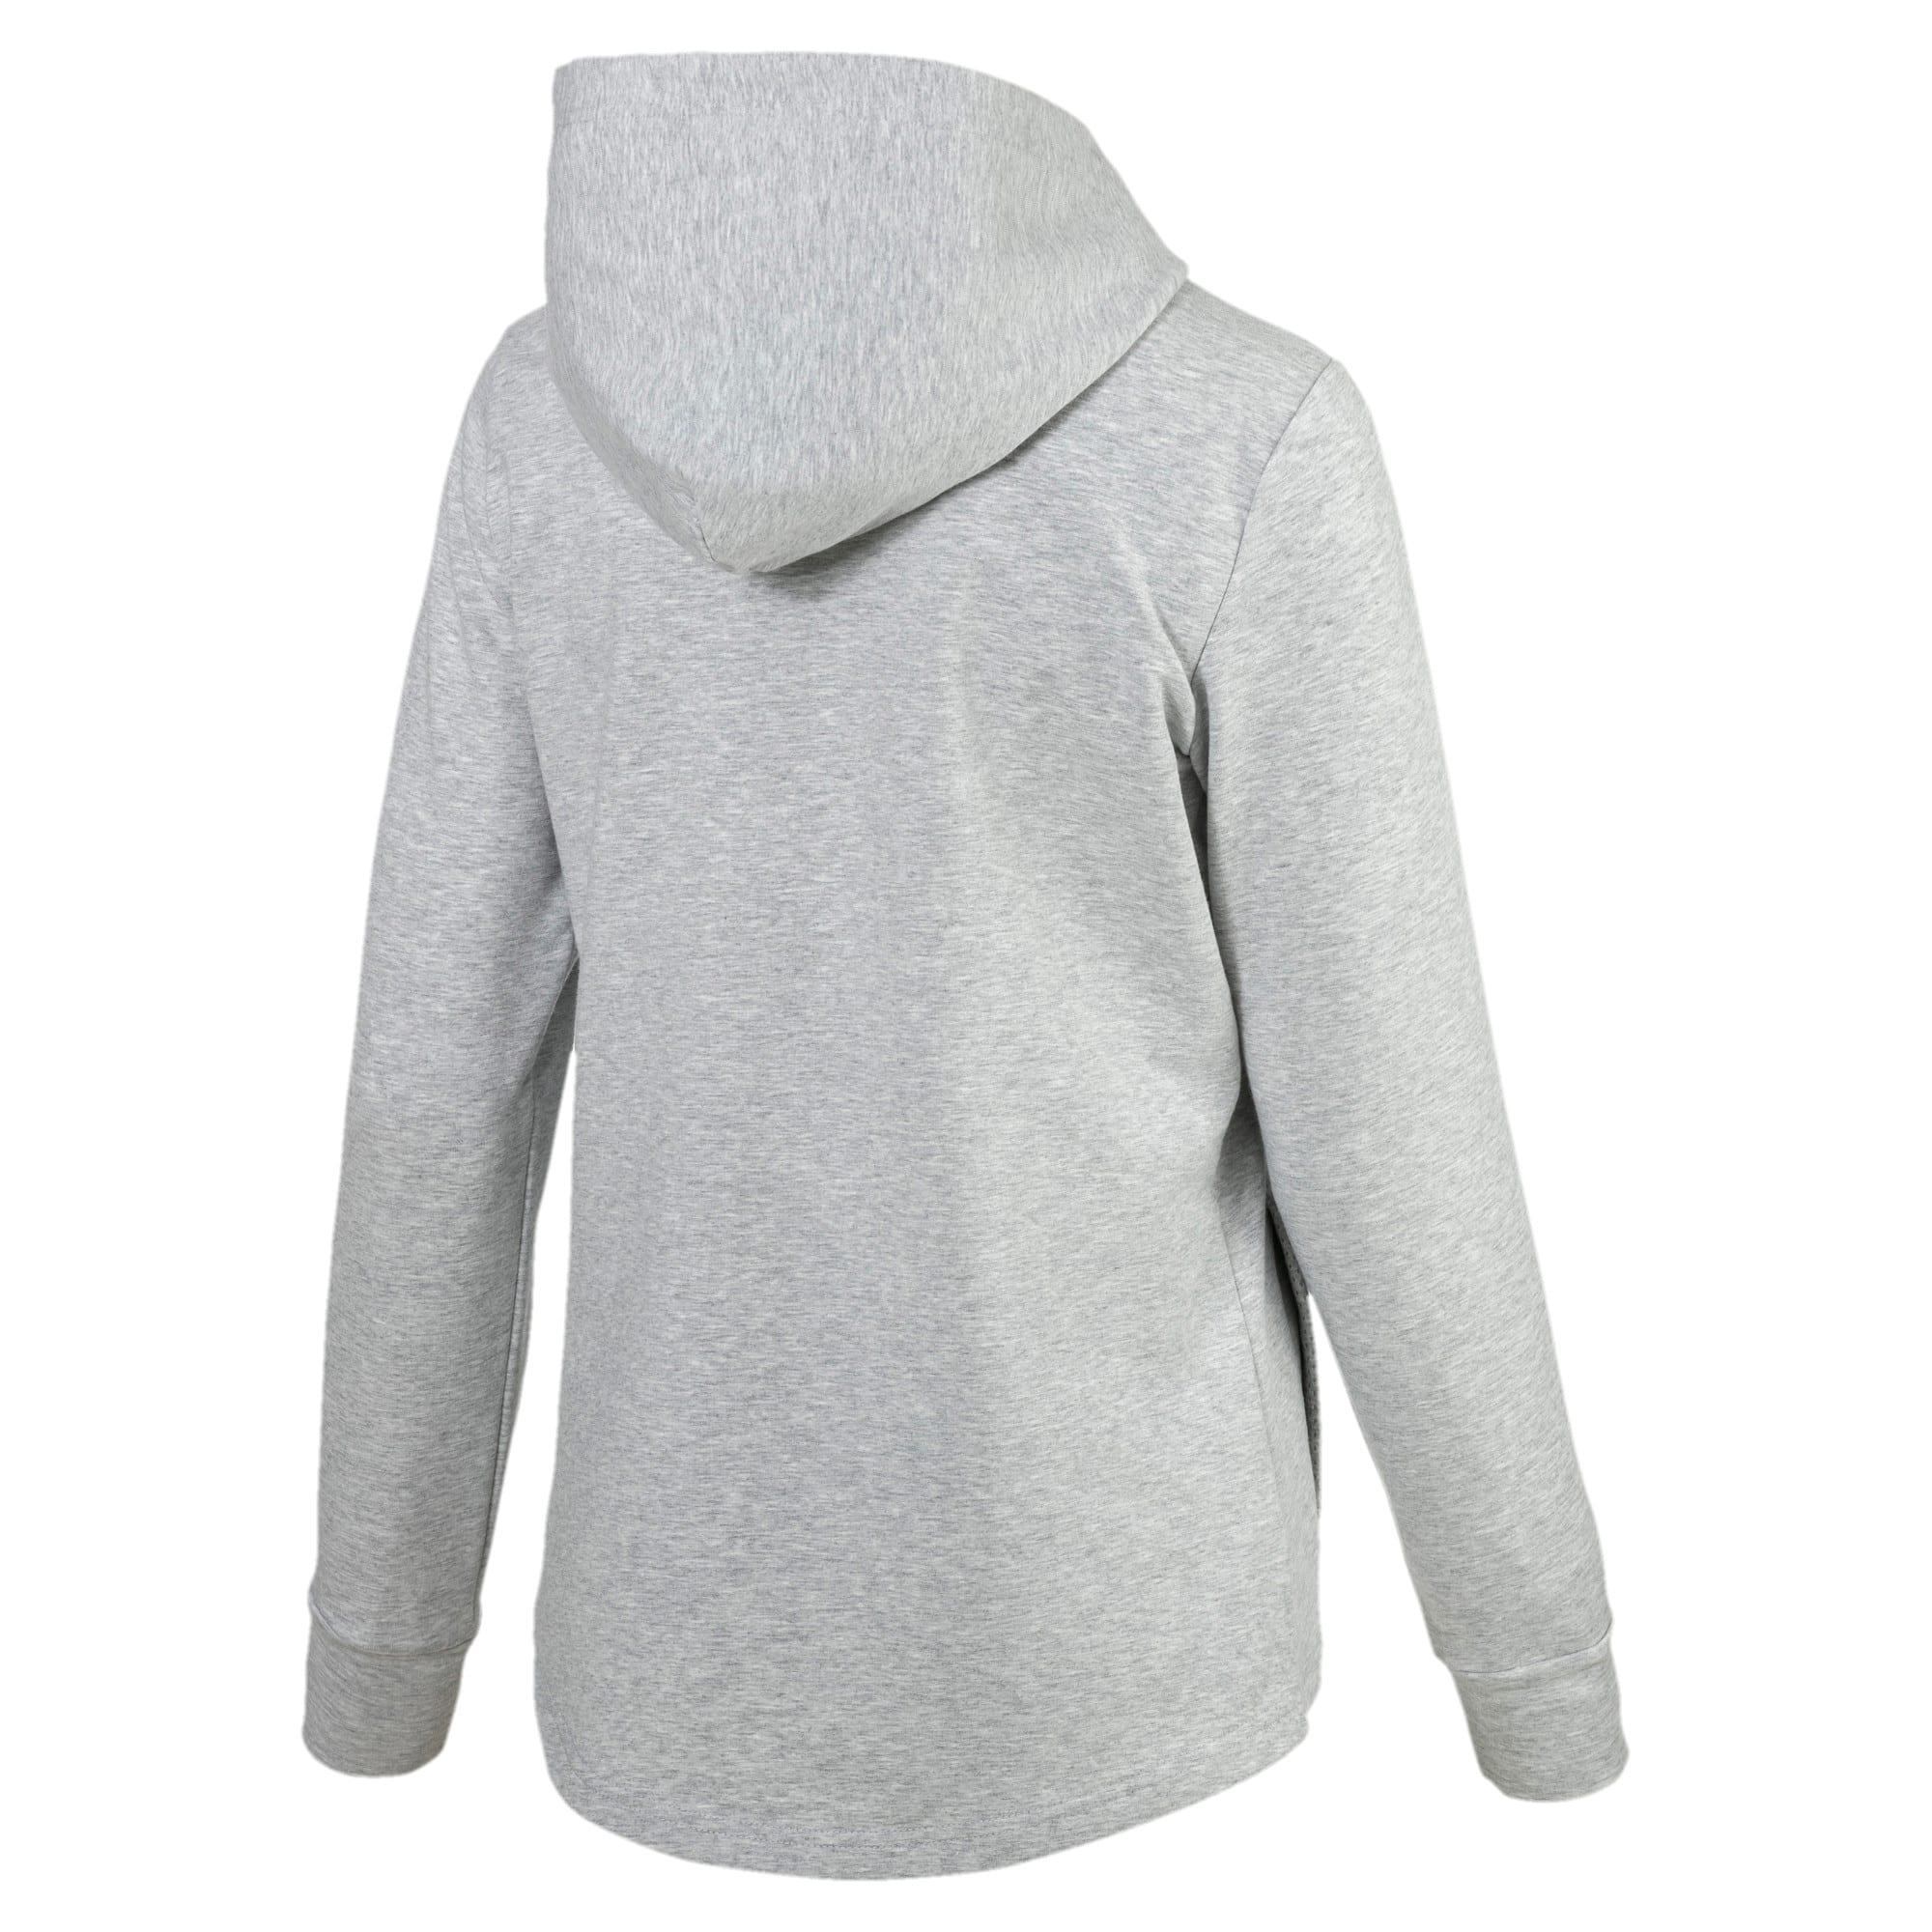 Thumbnail 3 of Modern Sports Hooded Jacket, Light Gray Heather, medium